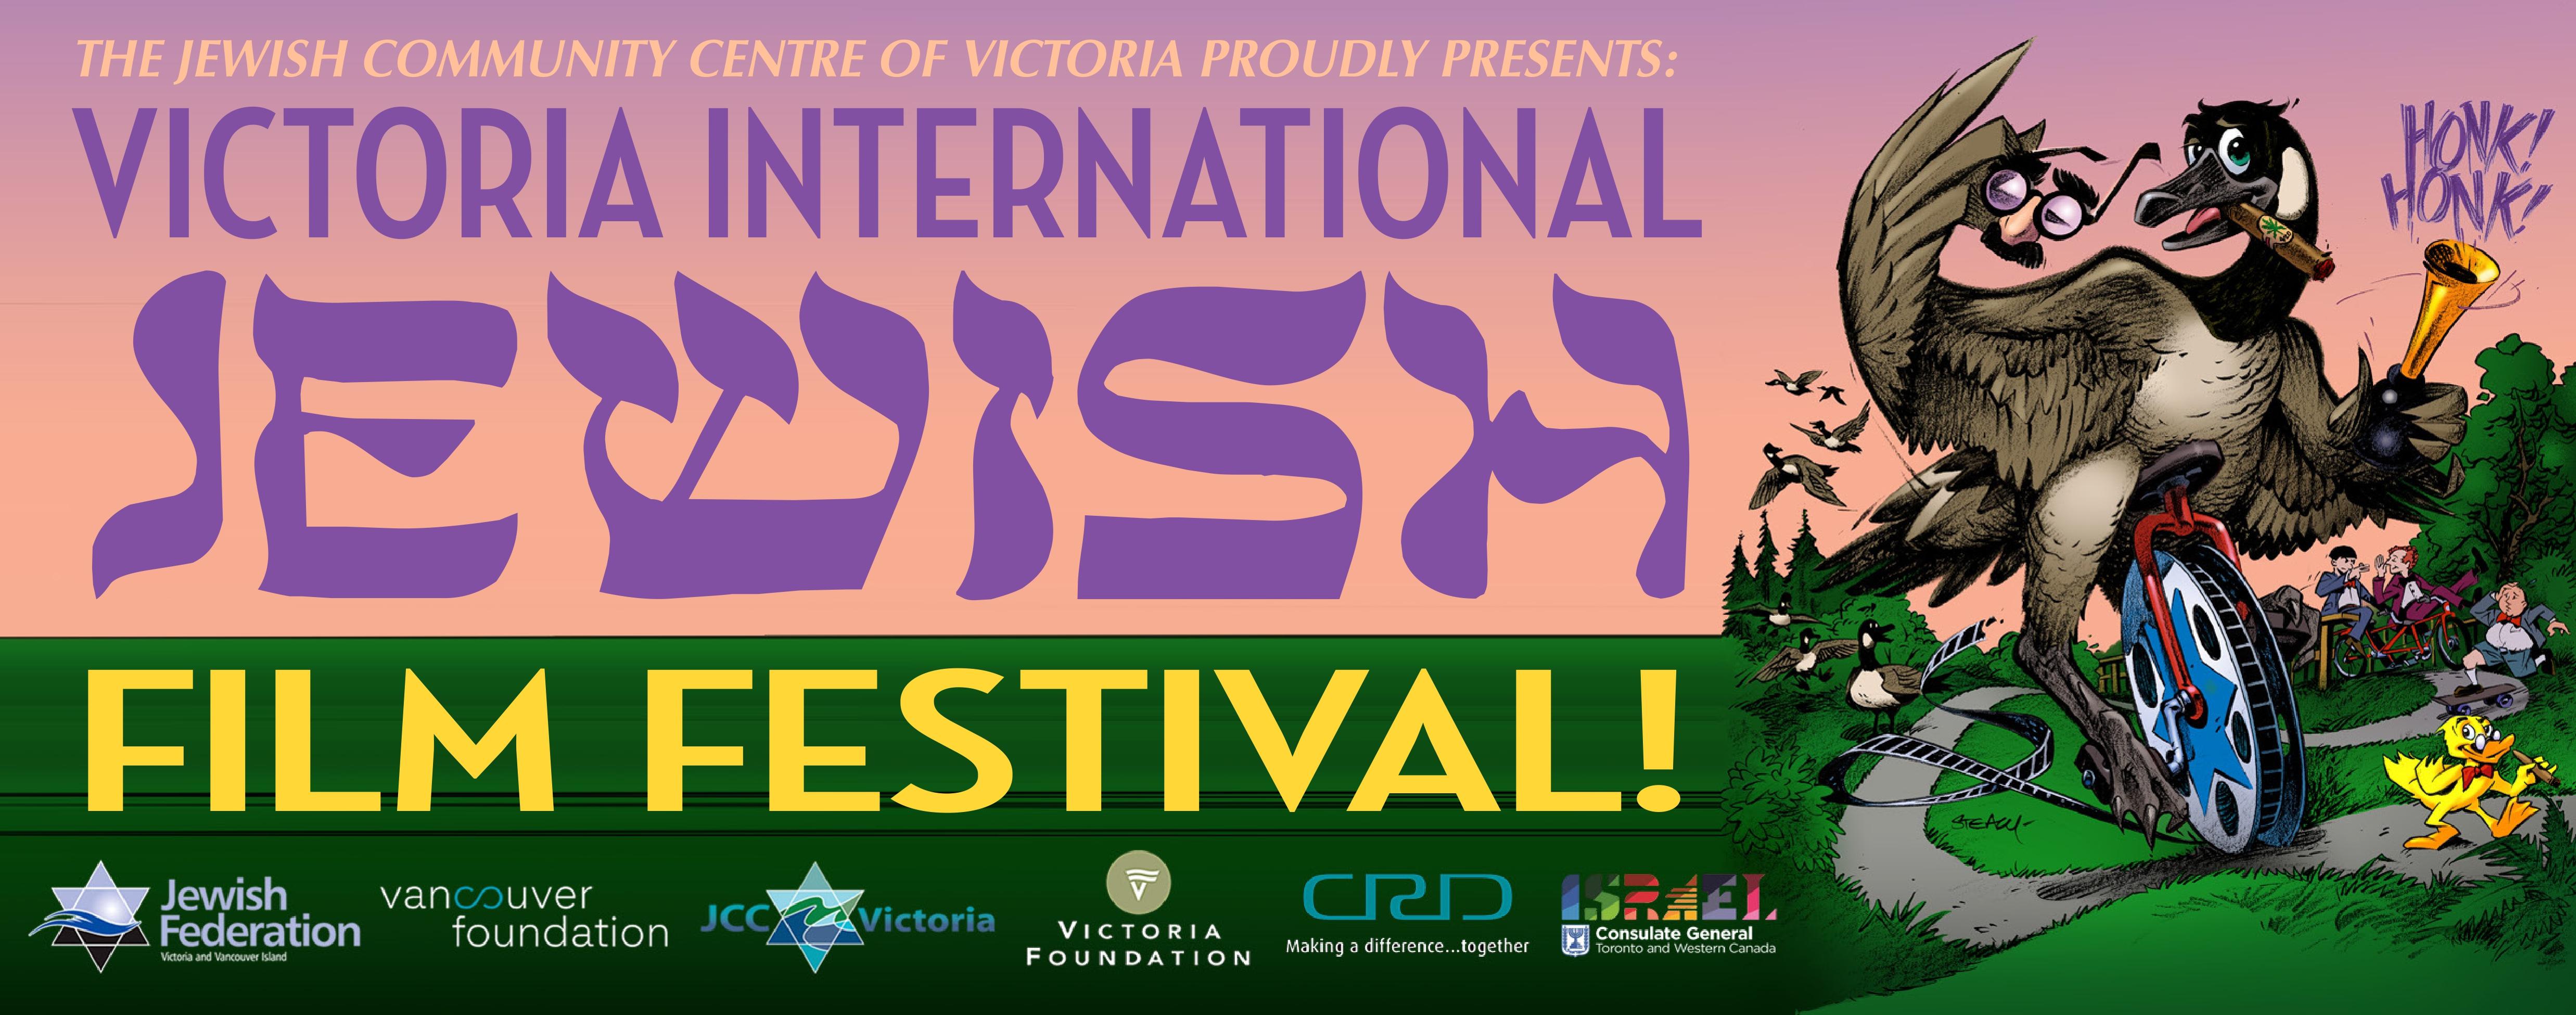 7th Annual Victoria International Jewish Film Festival